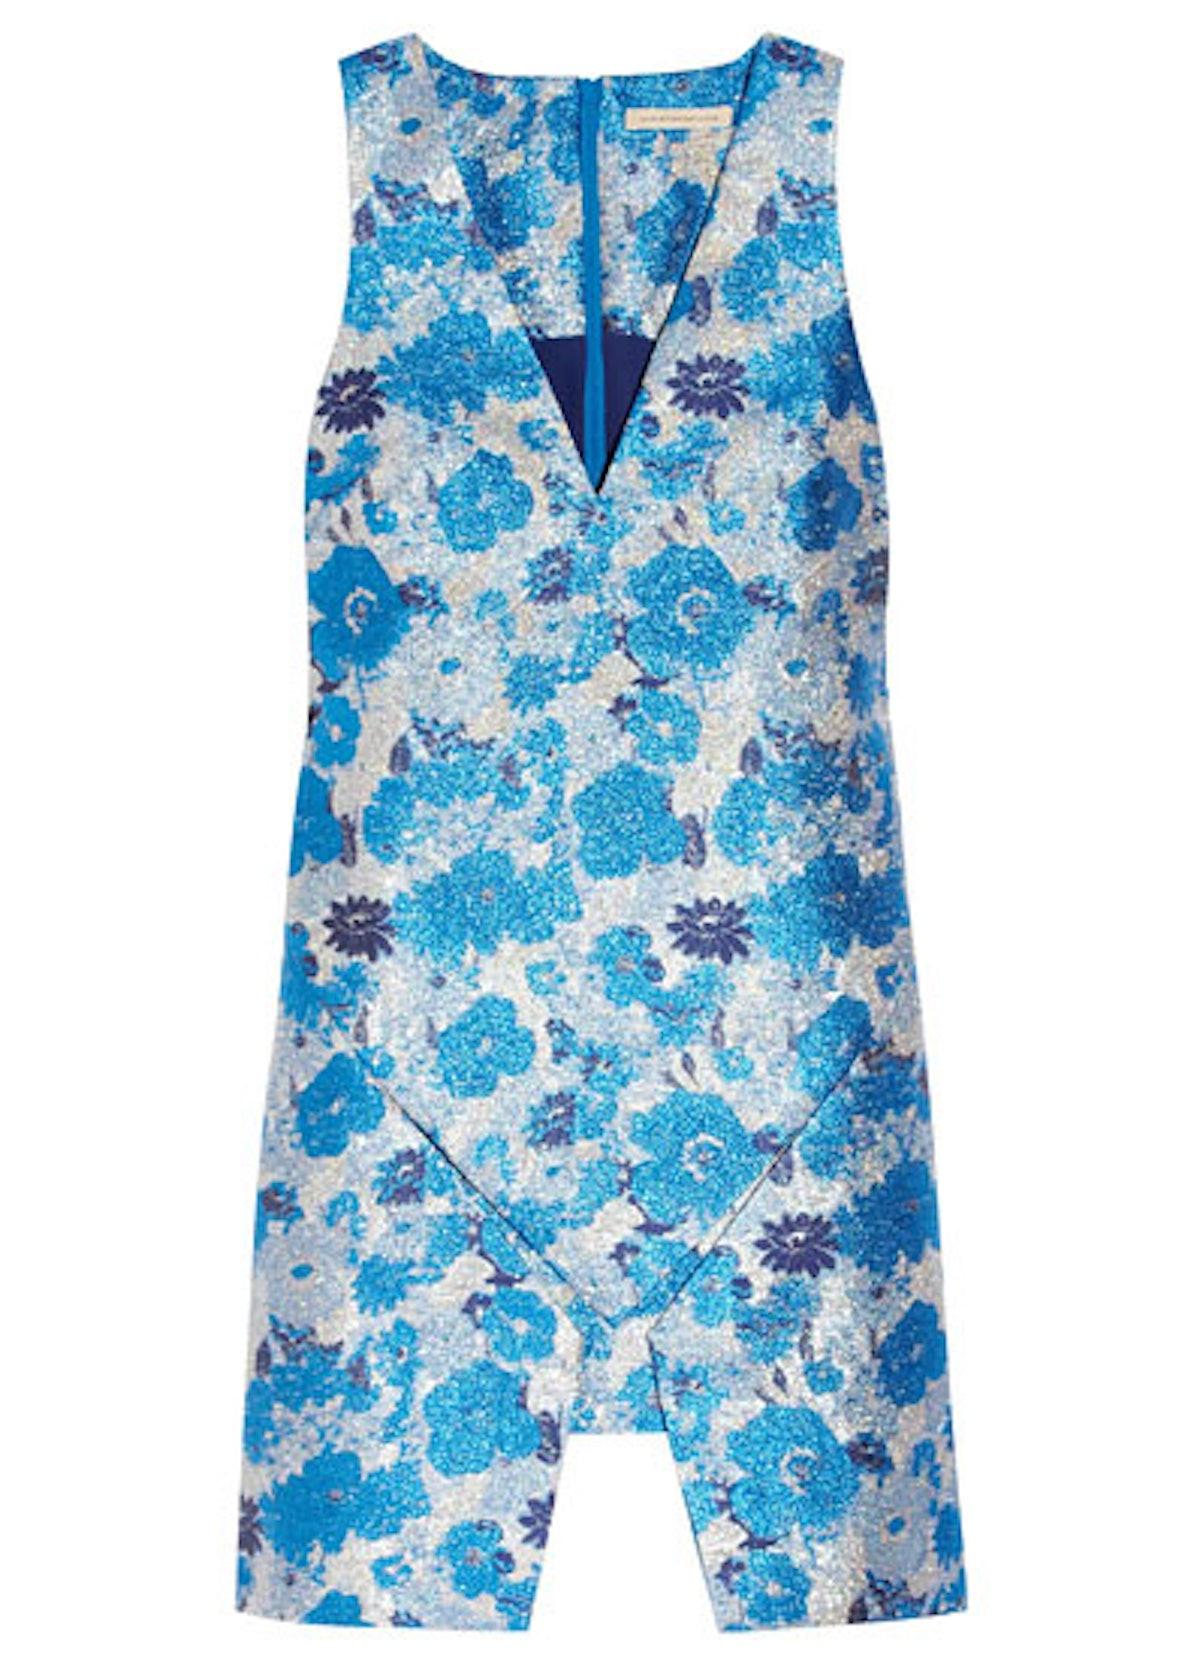 fass-floral-dresses-06-v.jpg